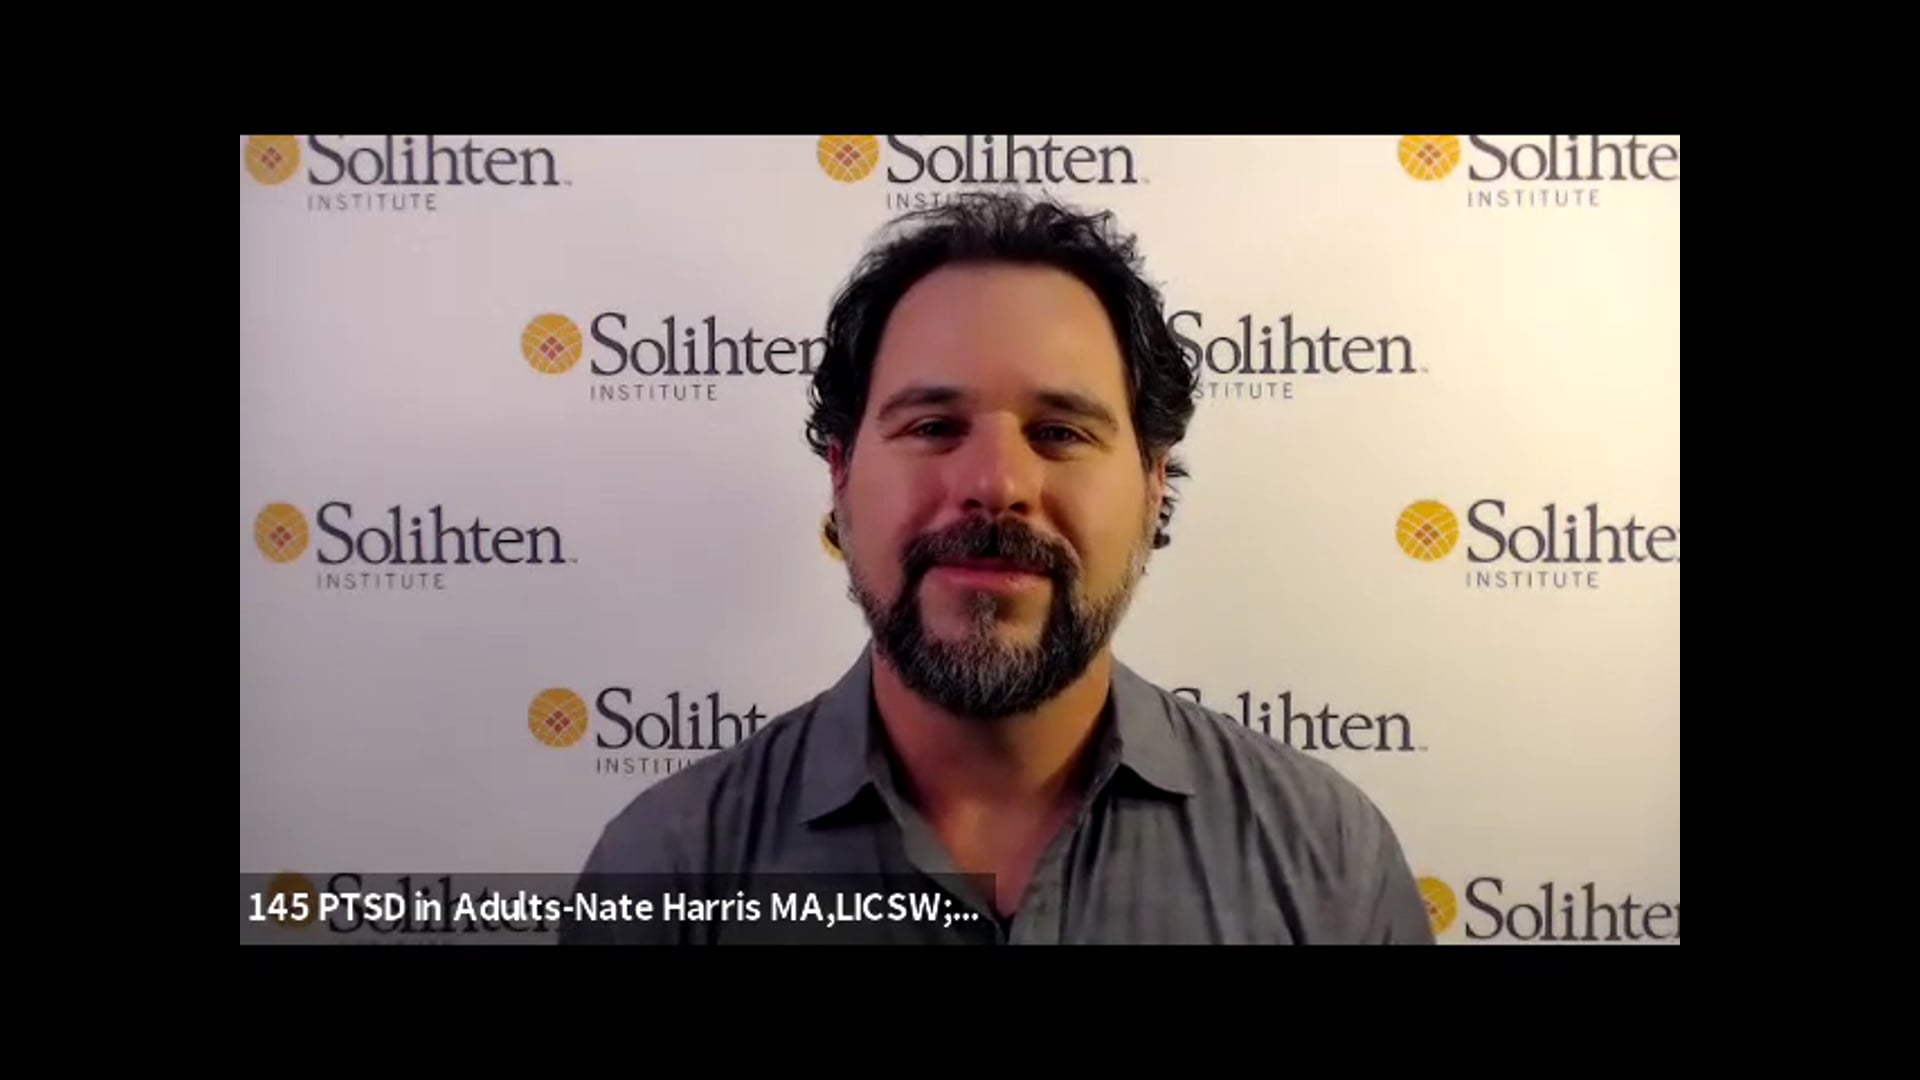 Nate Harris, LICSW